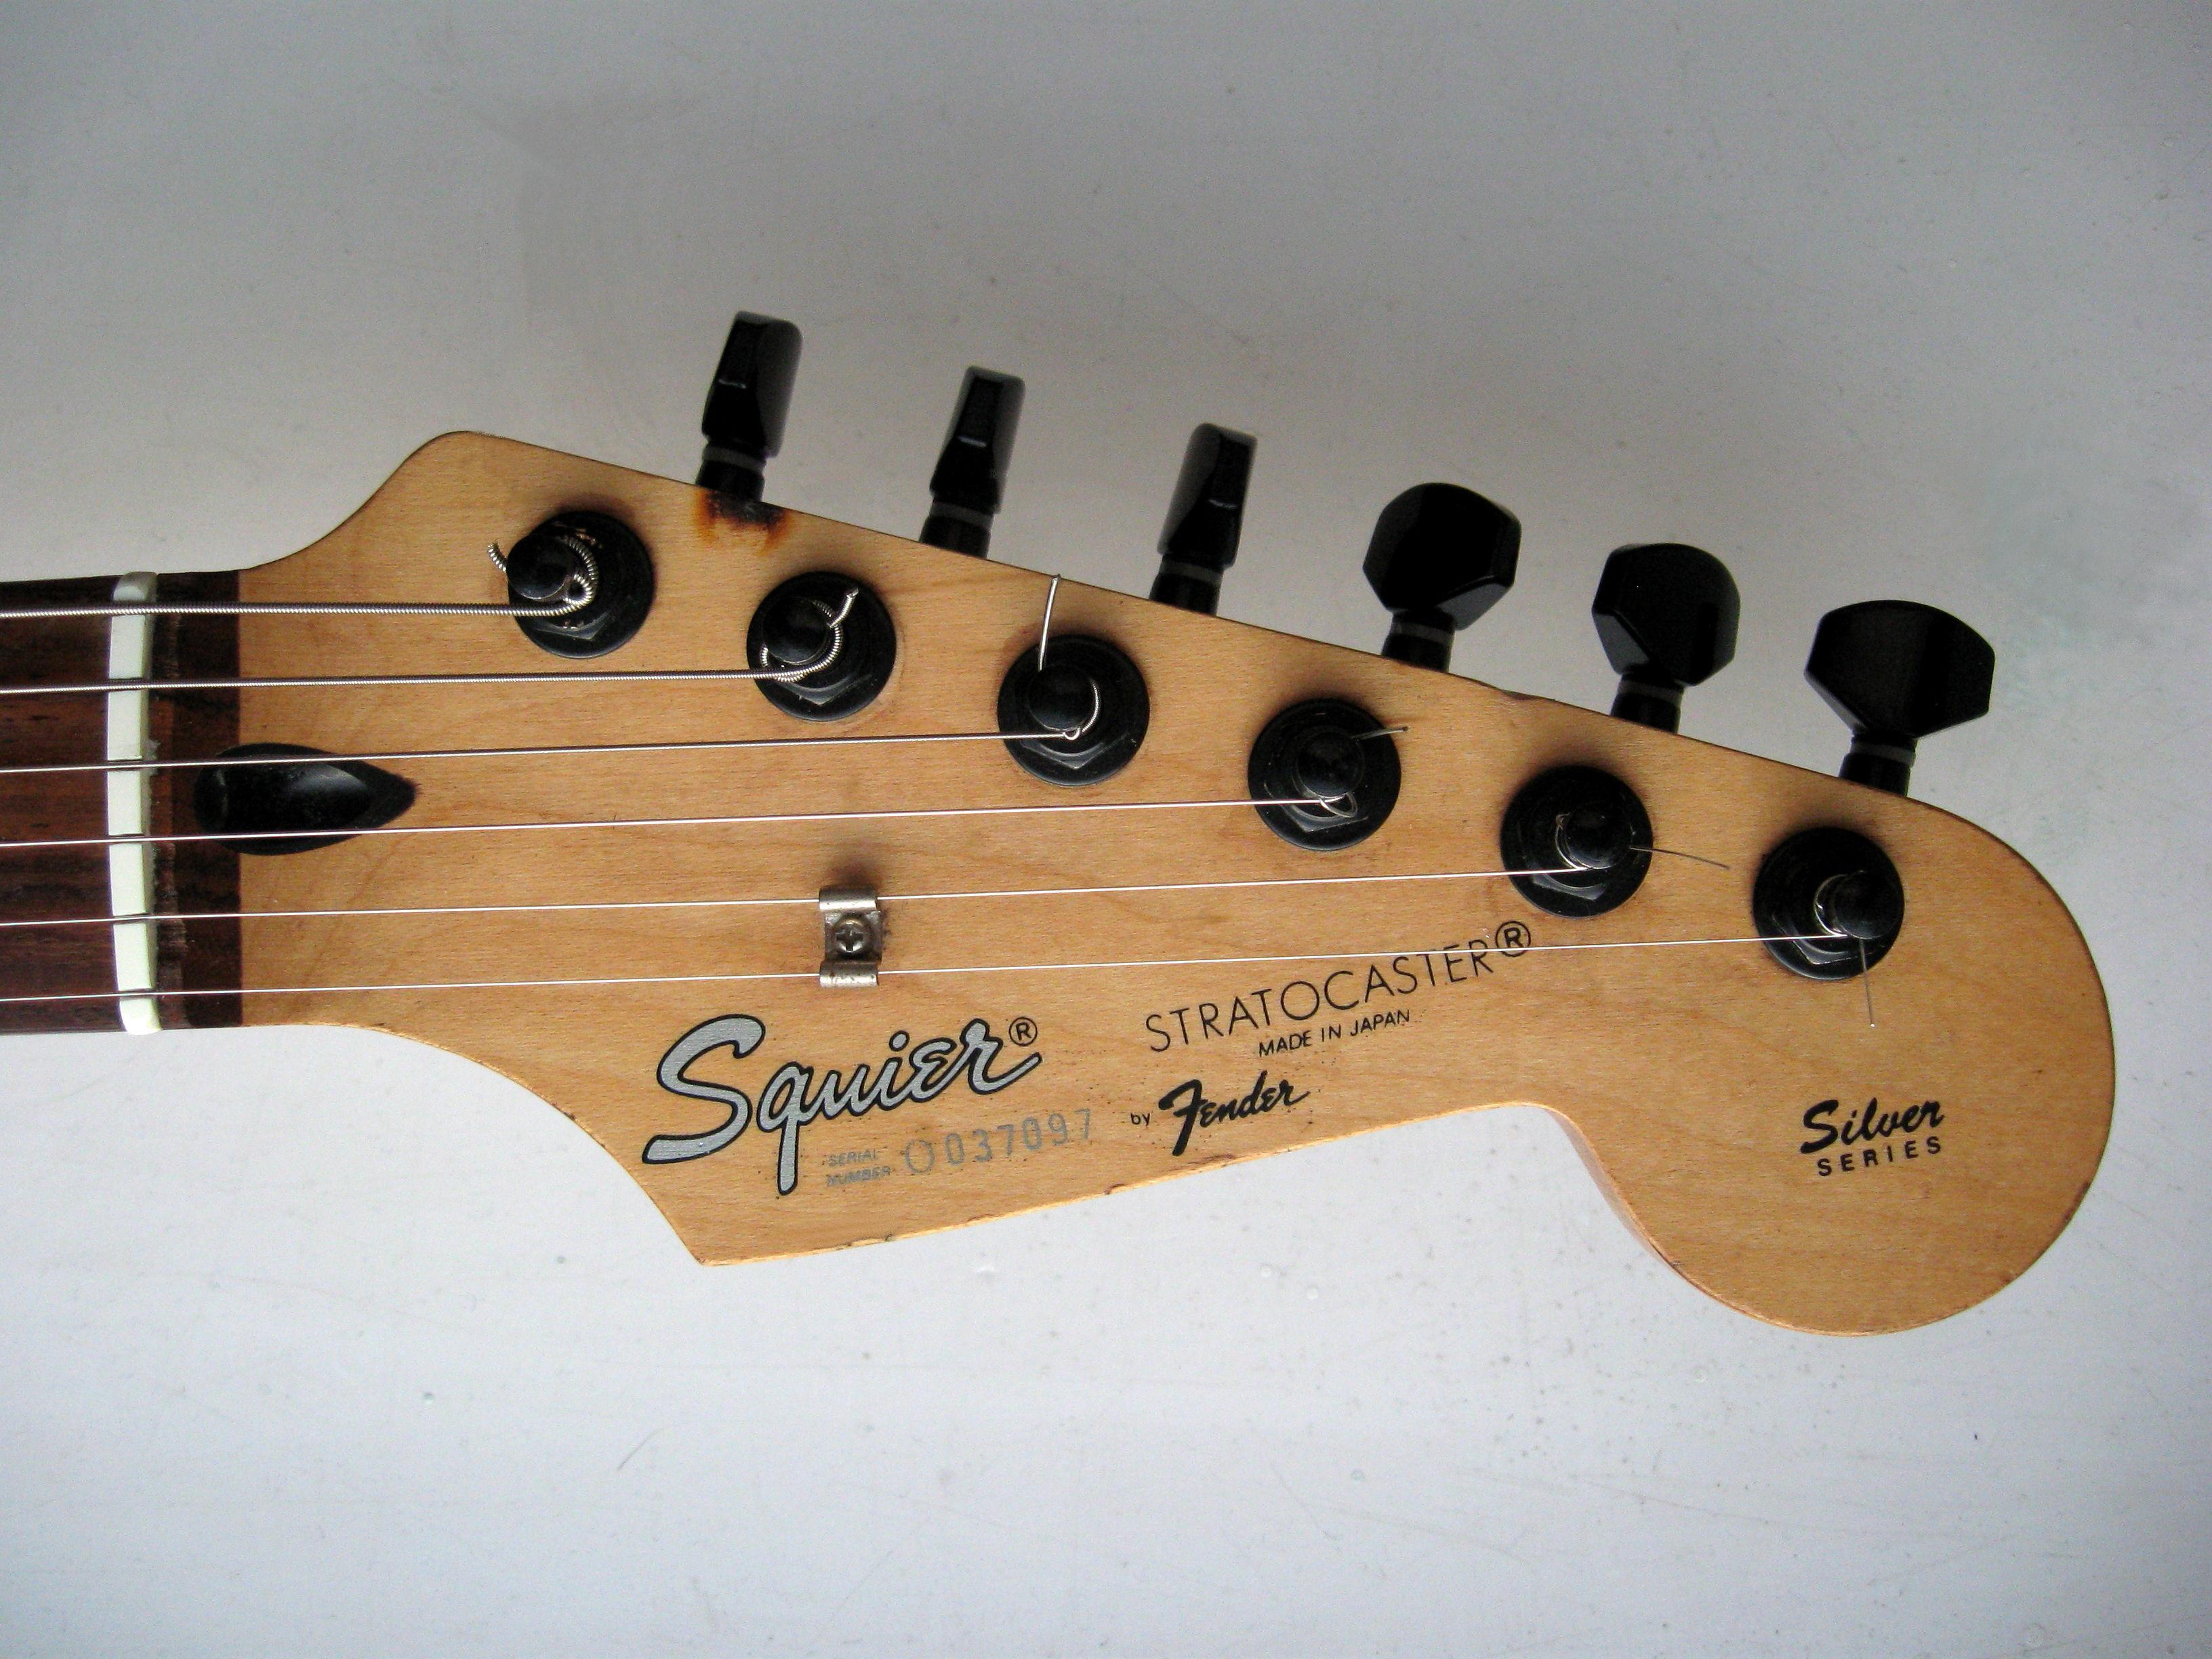 Squier Stratocaster serie nummer dating